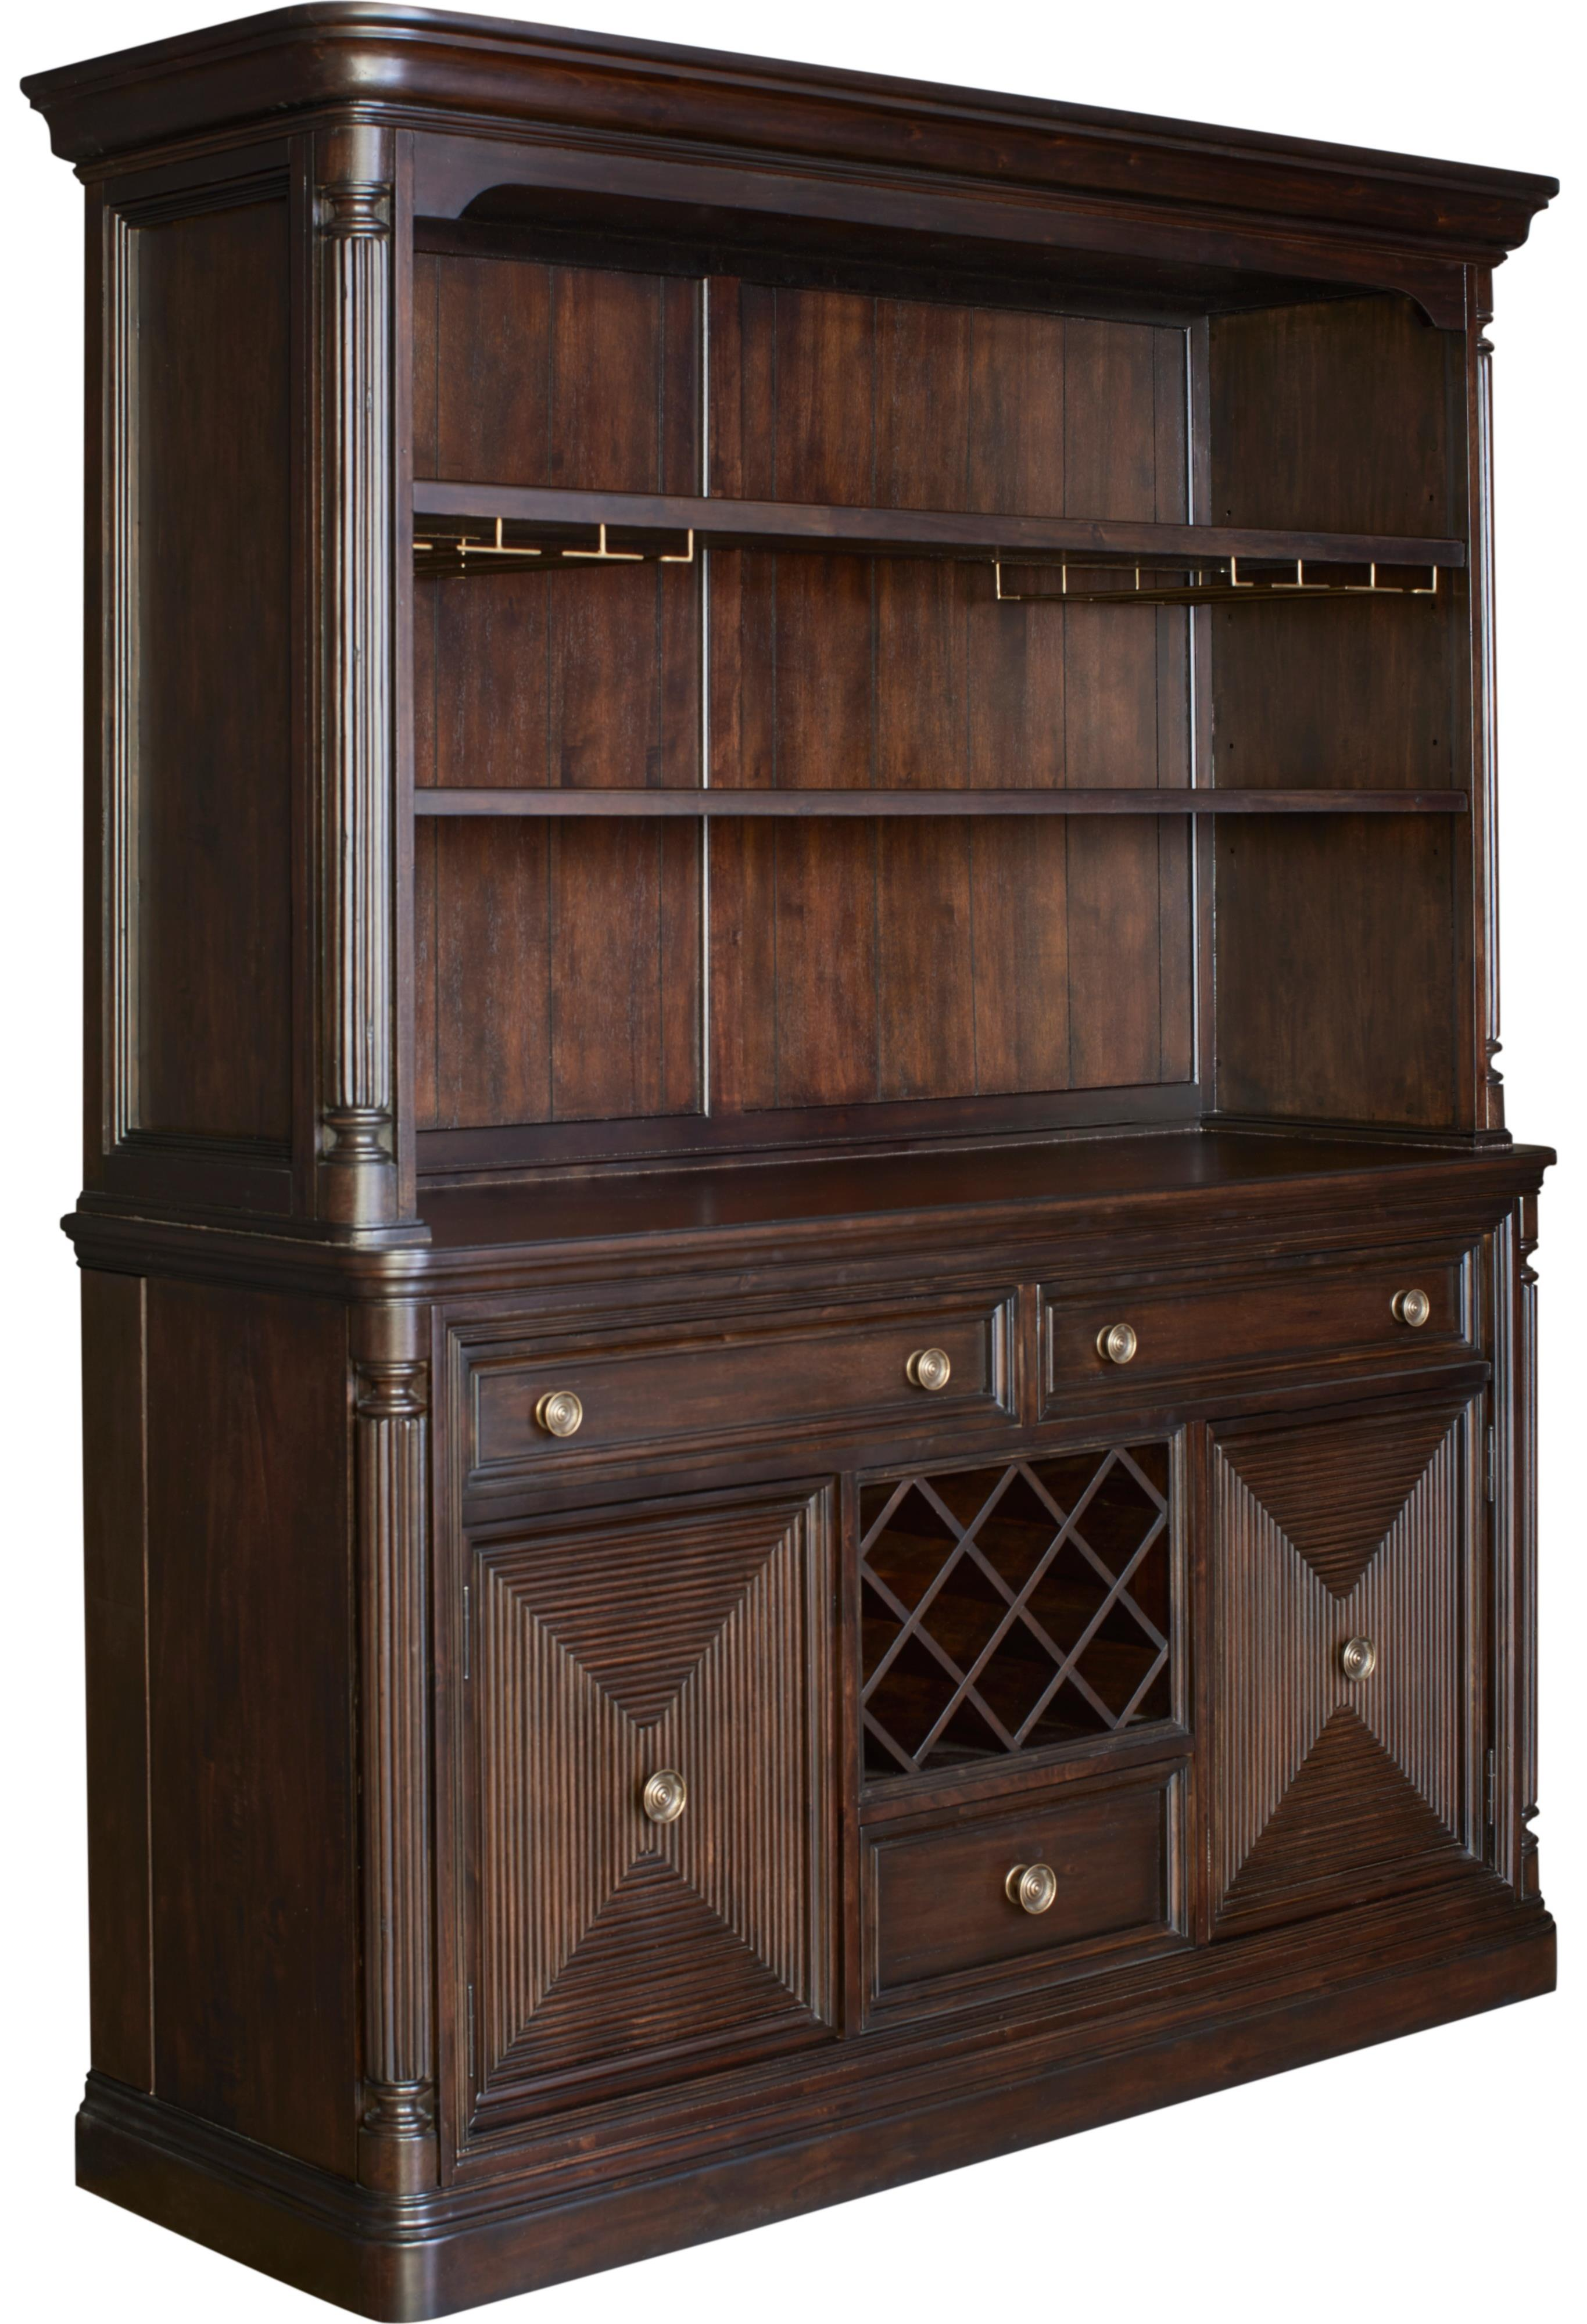 Broyhill Furniture Jessa Server and Hutch - Item Number: 4980-513+514